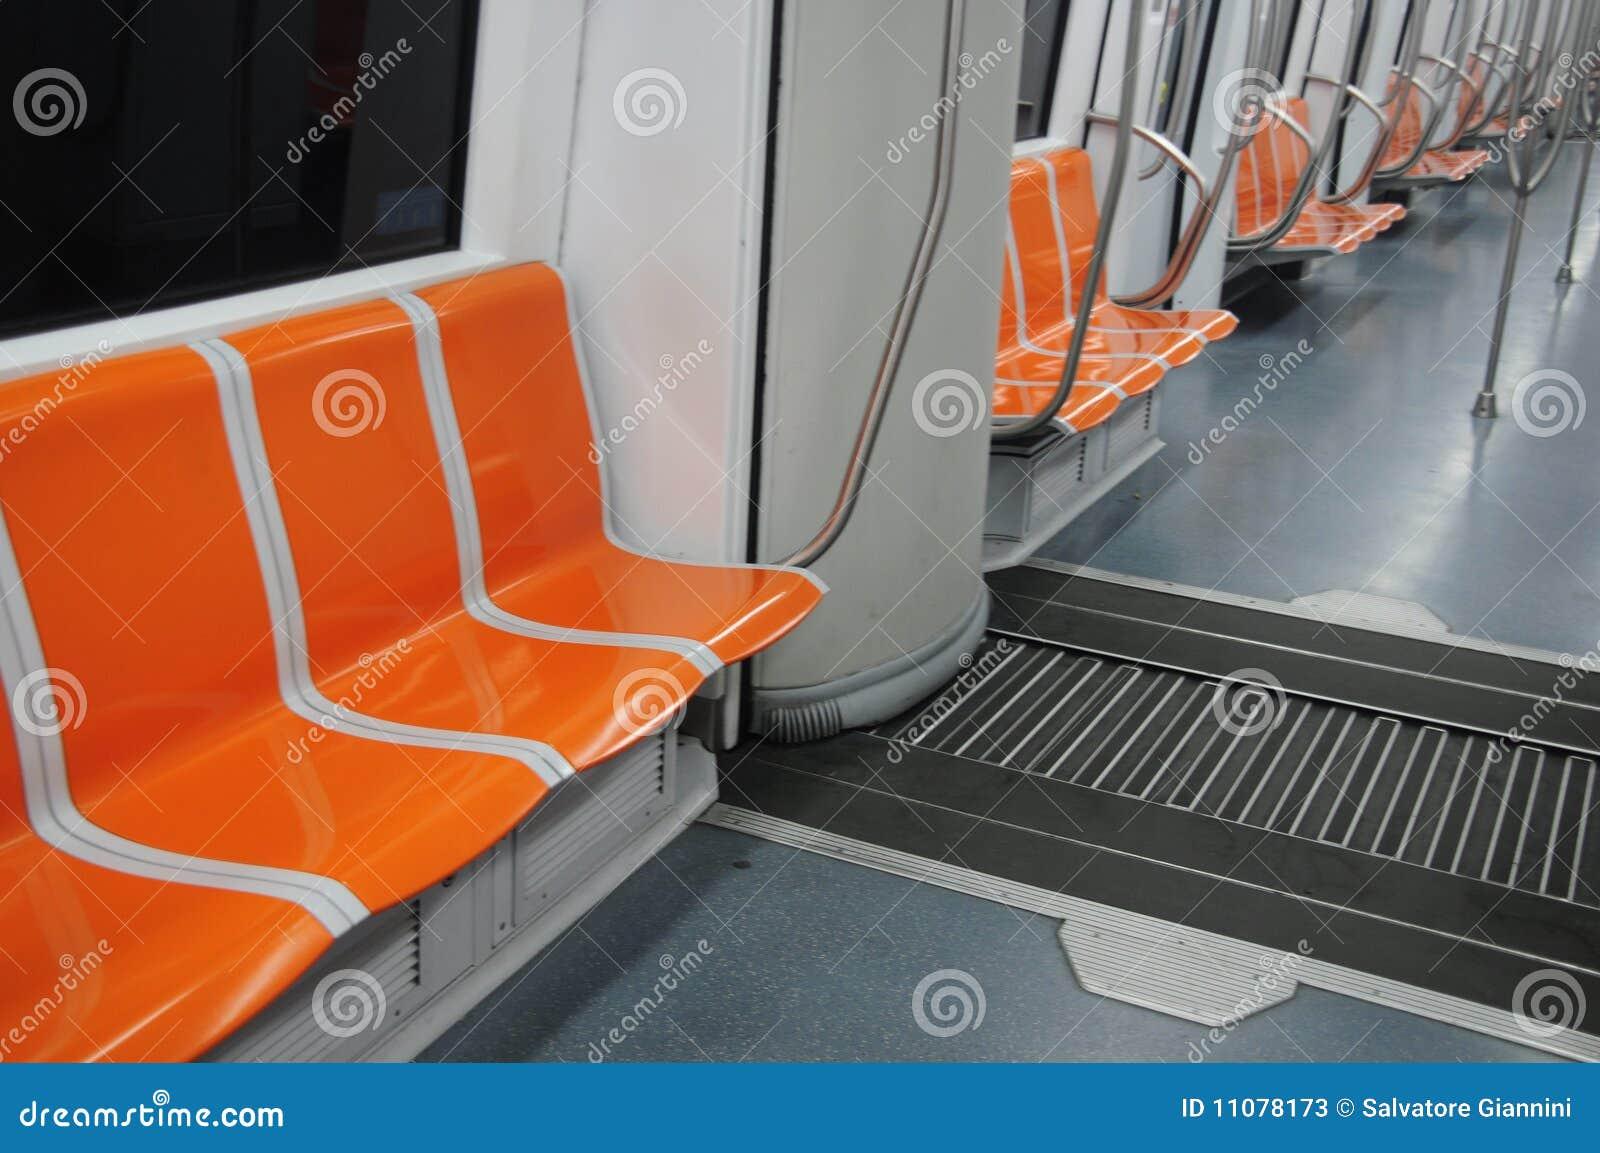 Metro carriage seats stock photos image 11078173 - Carrage metro ...